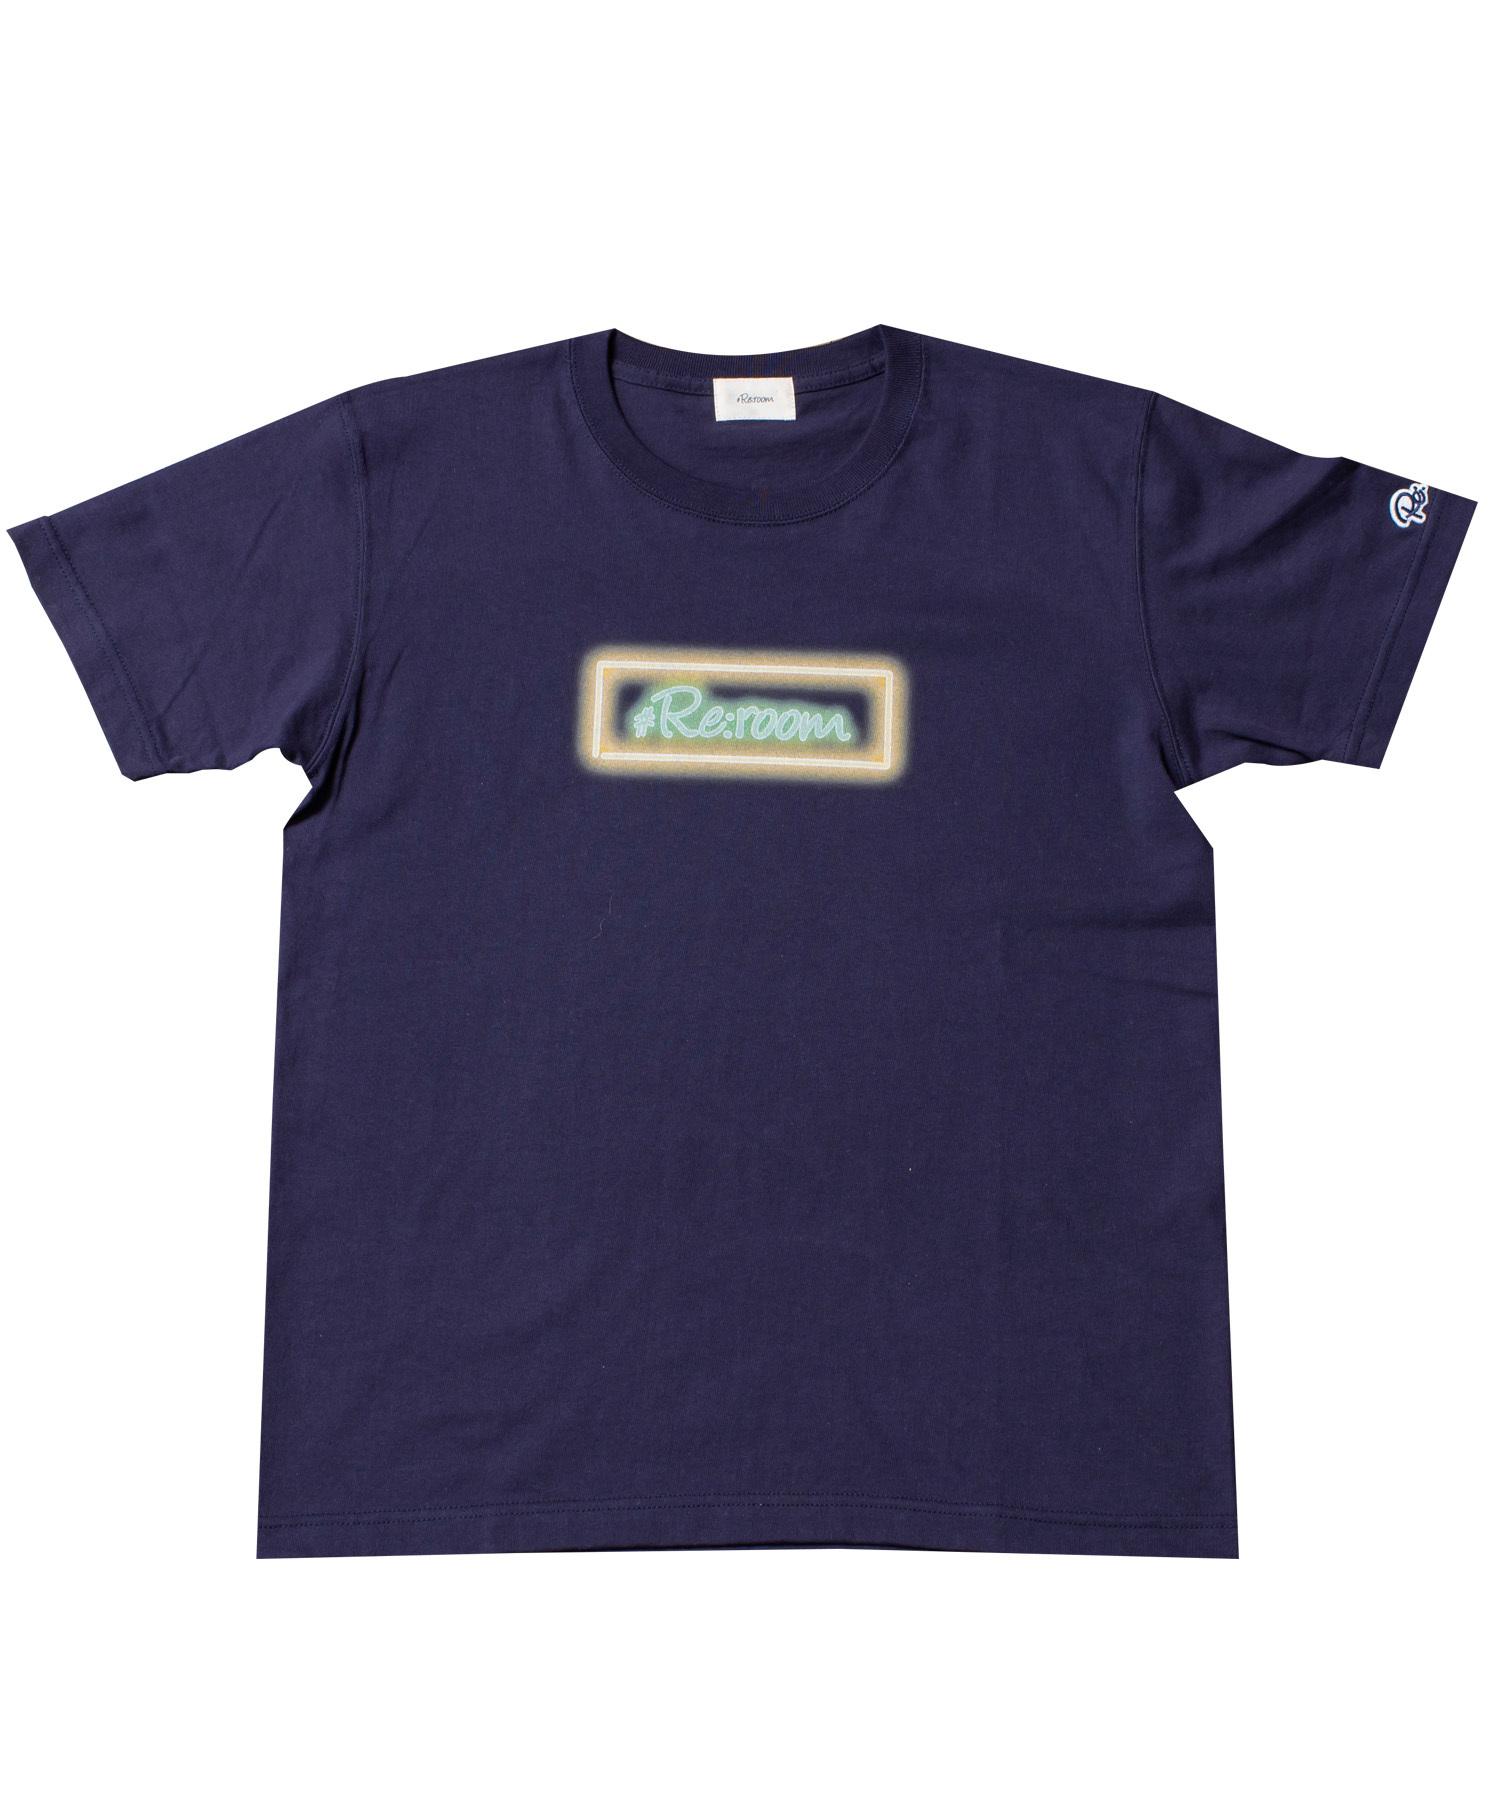 NEON BOX LOGO PRINT T-shirt[REC189]